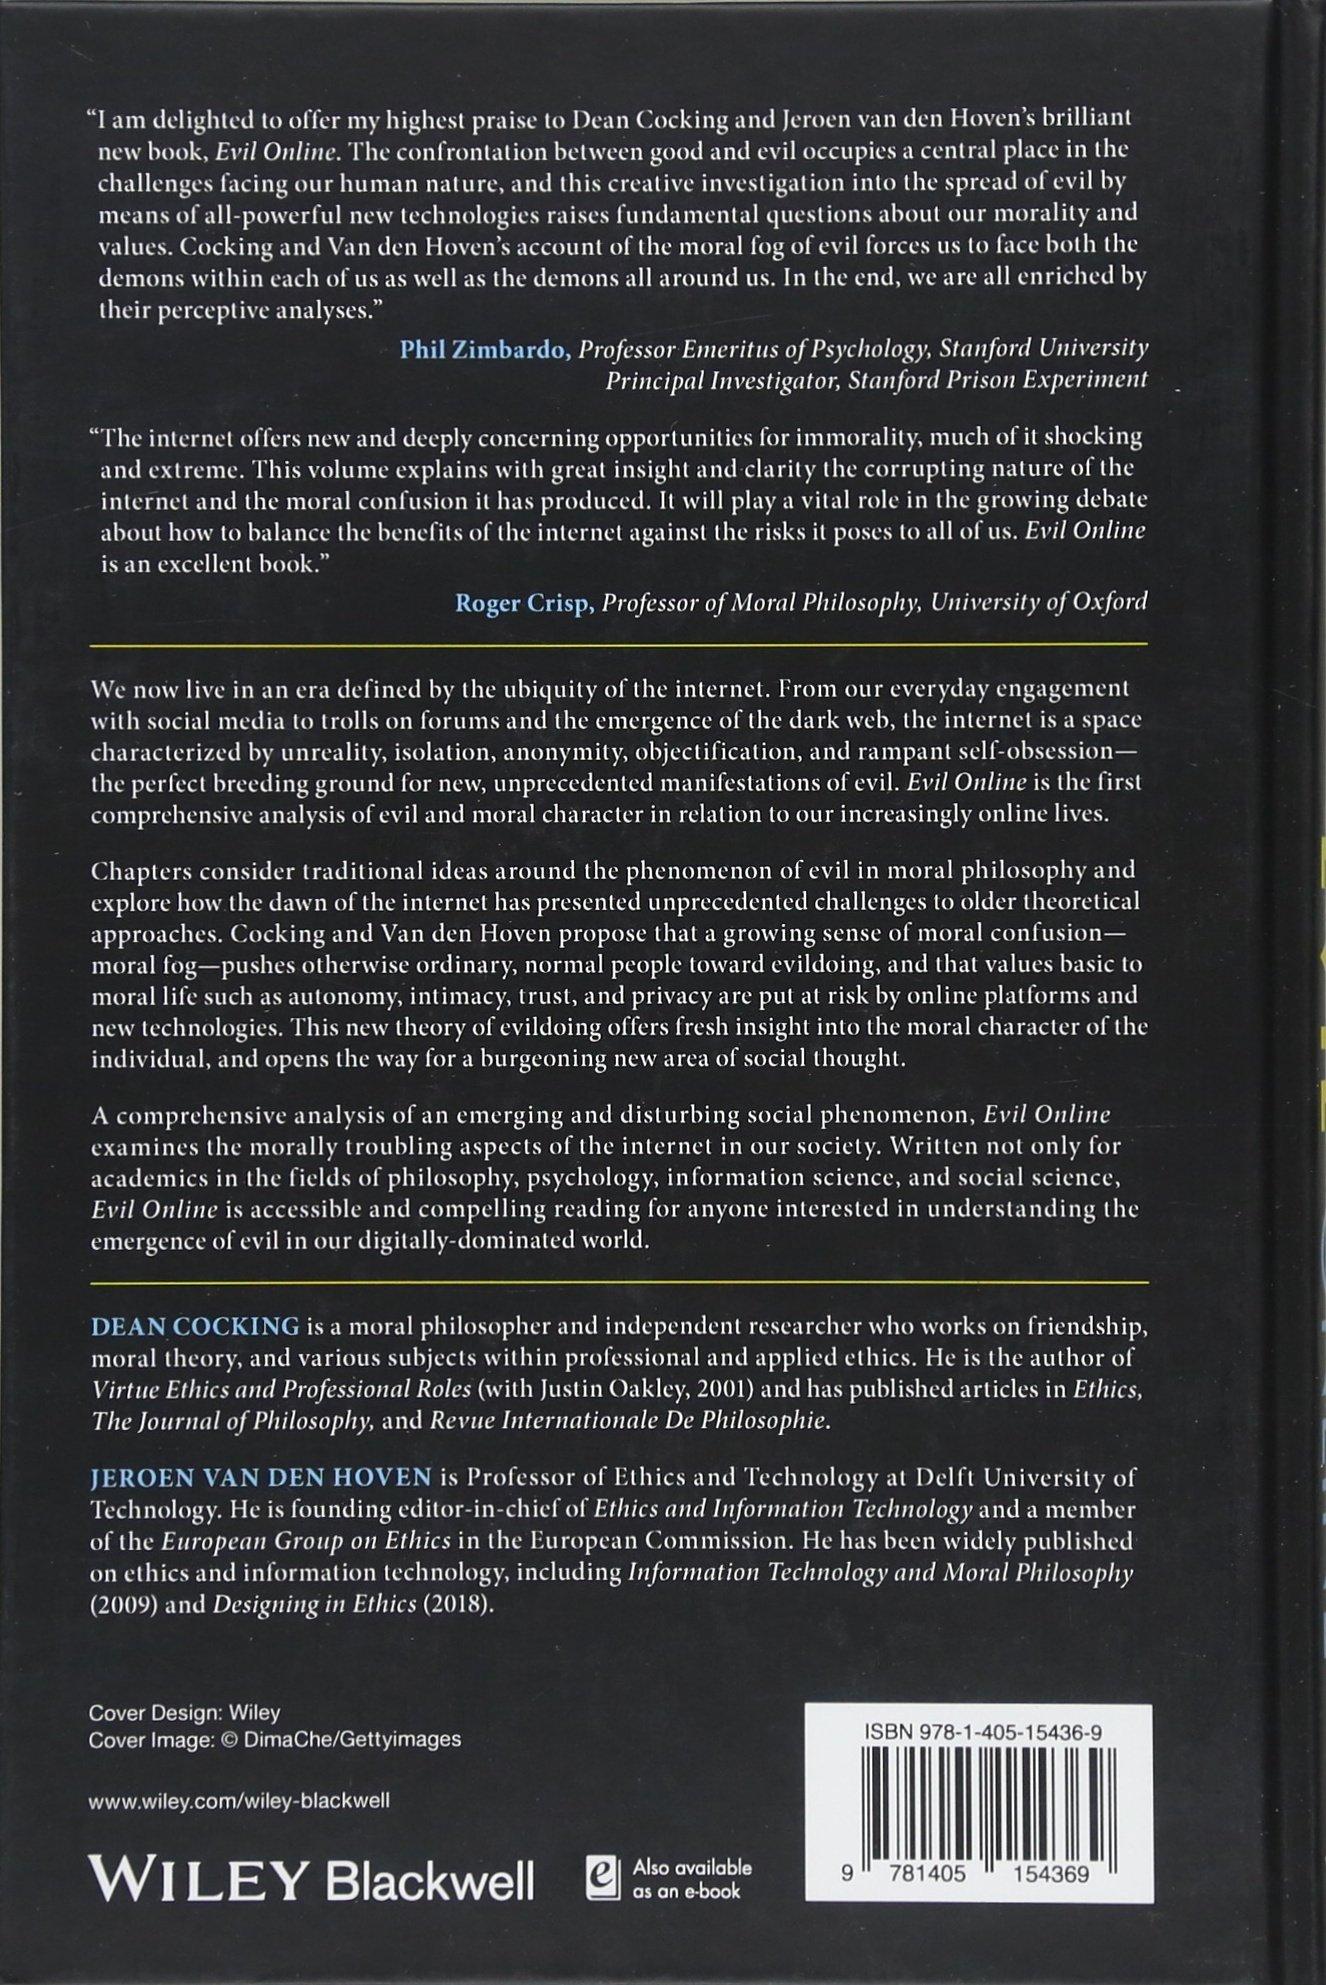 Buy Evil Online (Blackwell Public Philosophy Series) Book